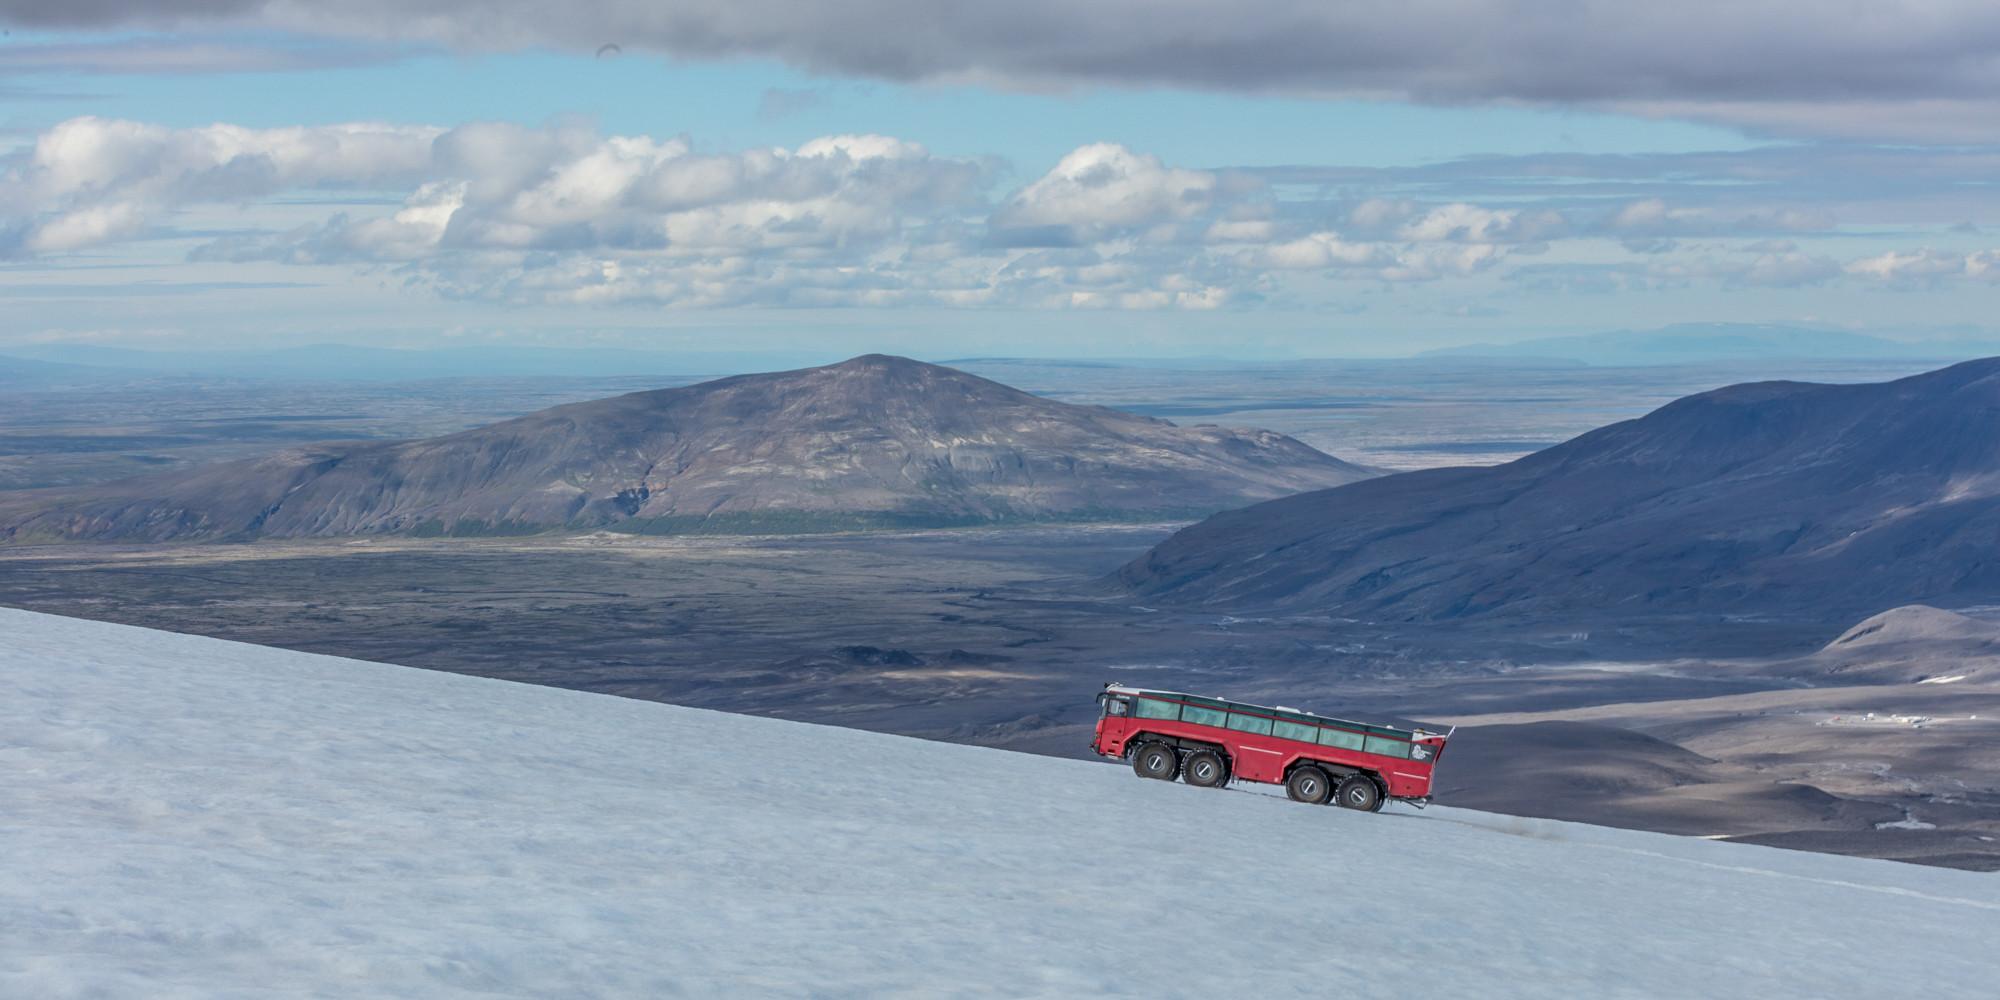 Glacier tour on Eyjafjallajökull